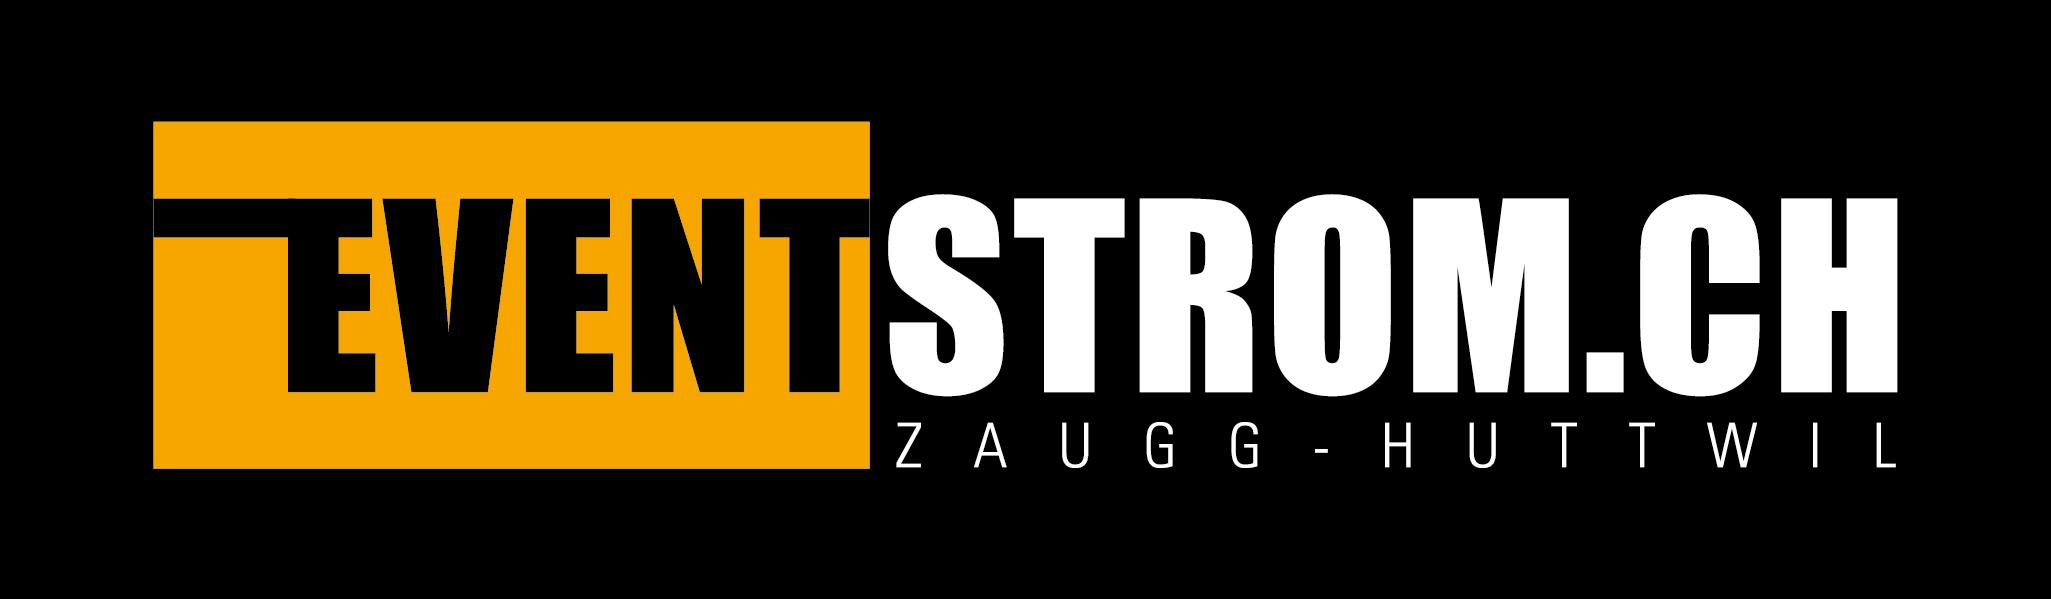 eventstrom.ch